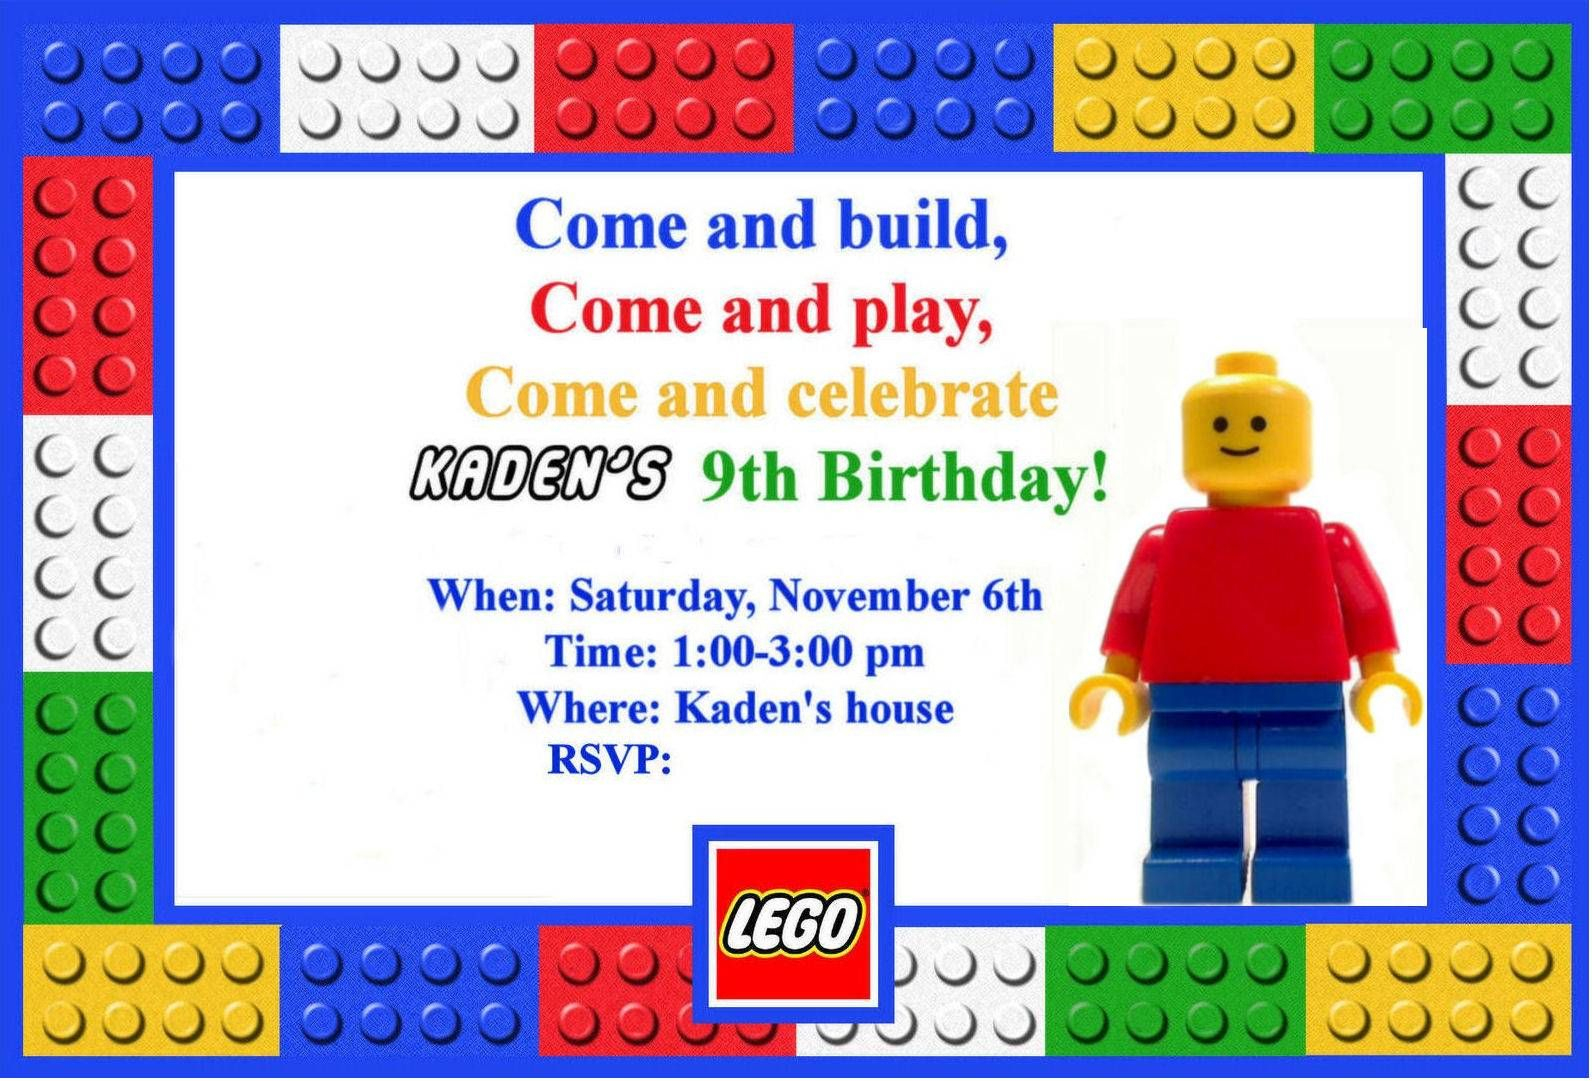 Free Printable Lego Birthday Invitations Boys – Invitetown - Lego Party Invitations Printable Free